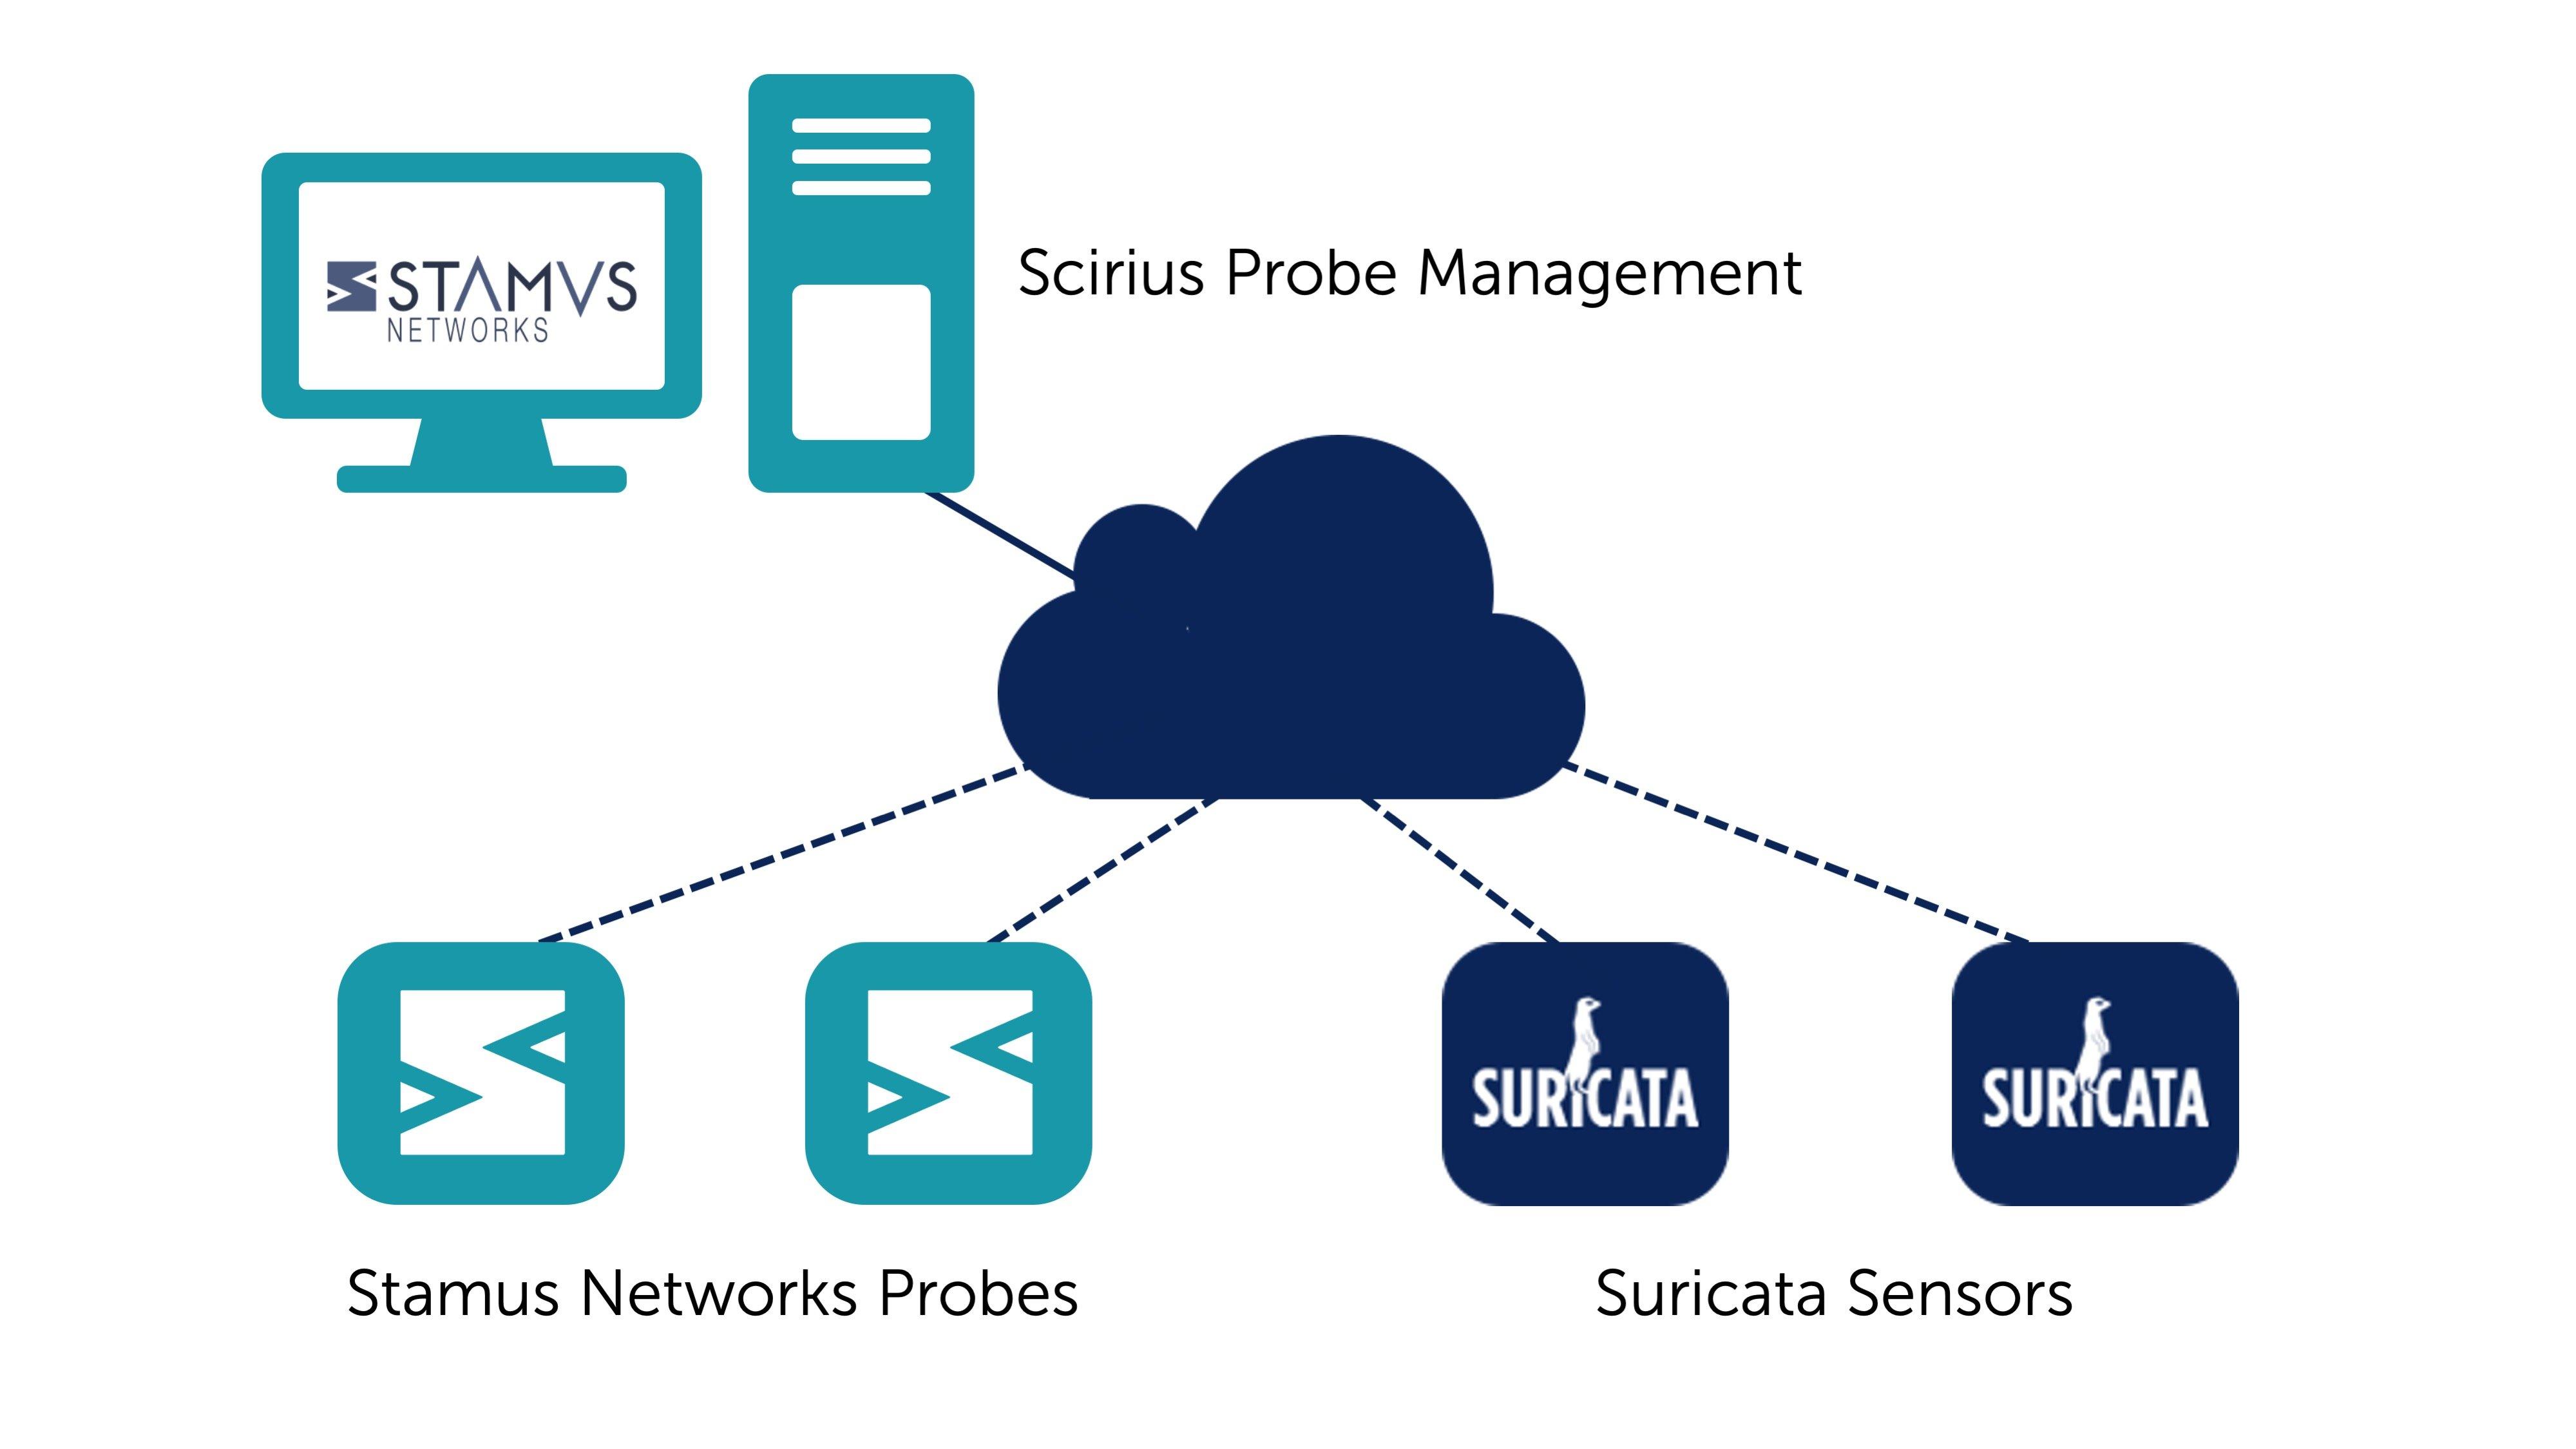 Scirius Probe Management from Stamus Networks